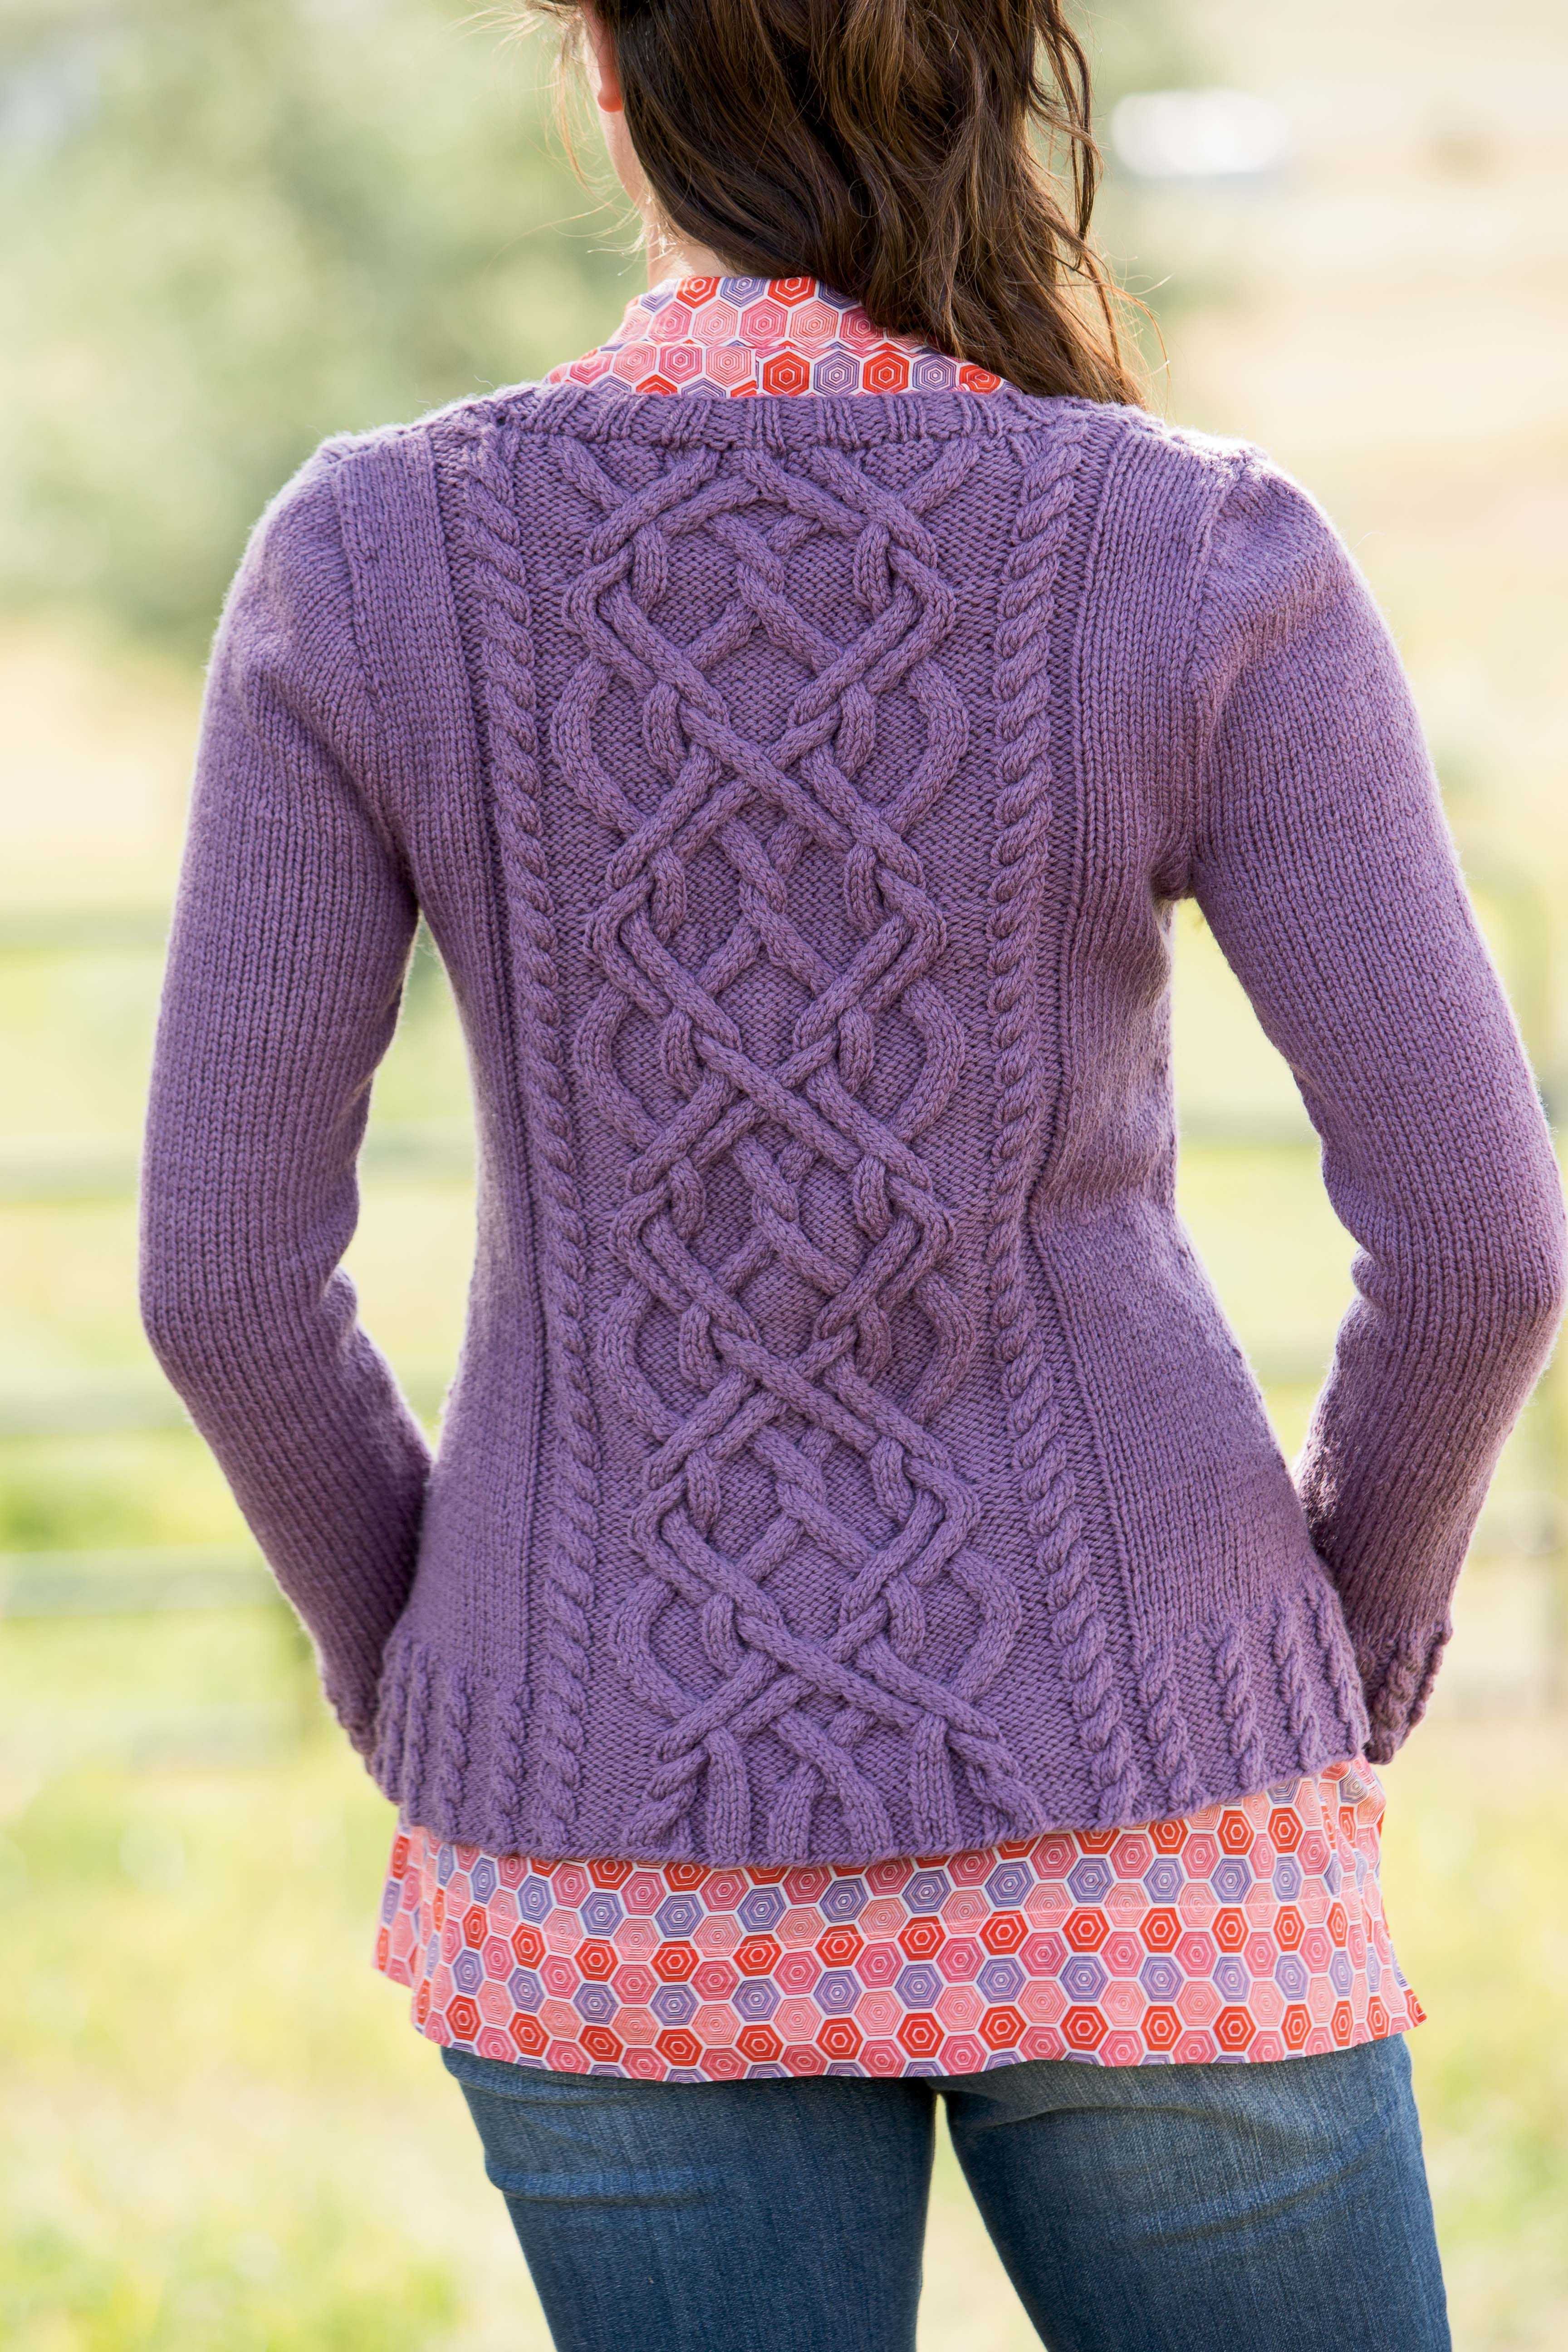 Knitted Yarn Patterns and Knitting Tutorials   Mantel ...